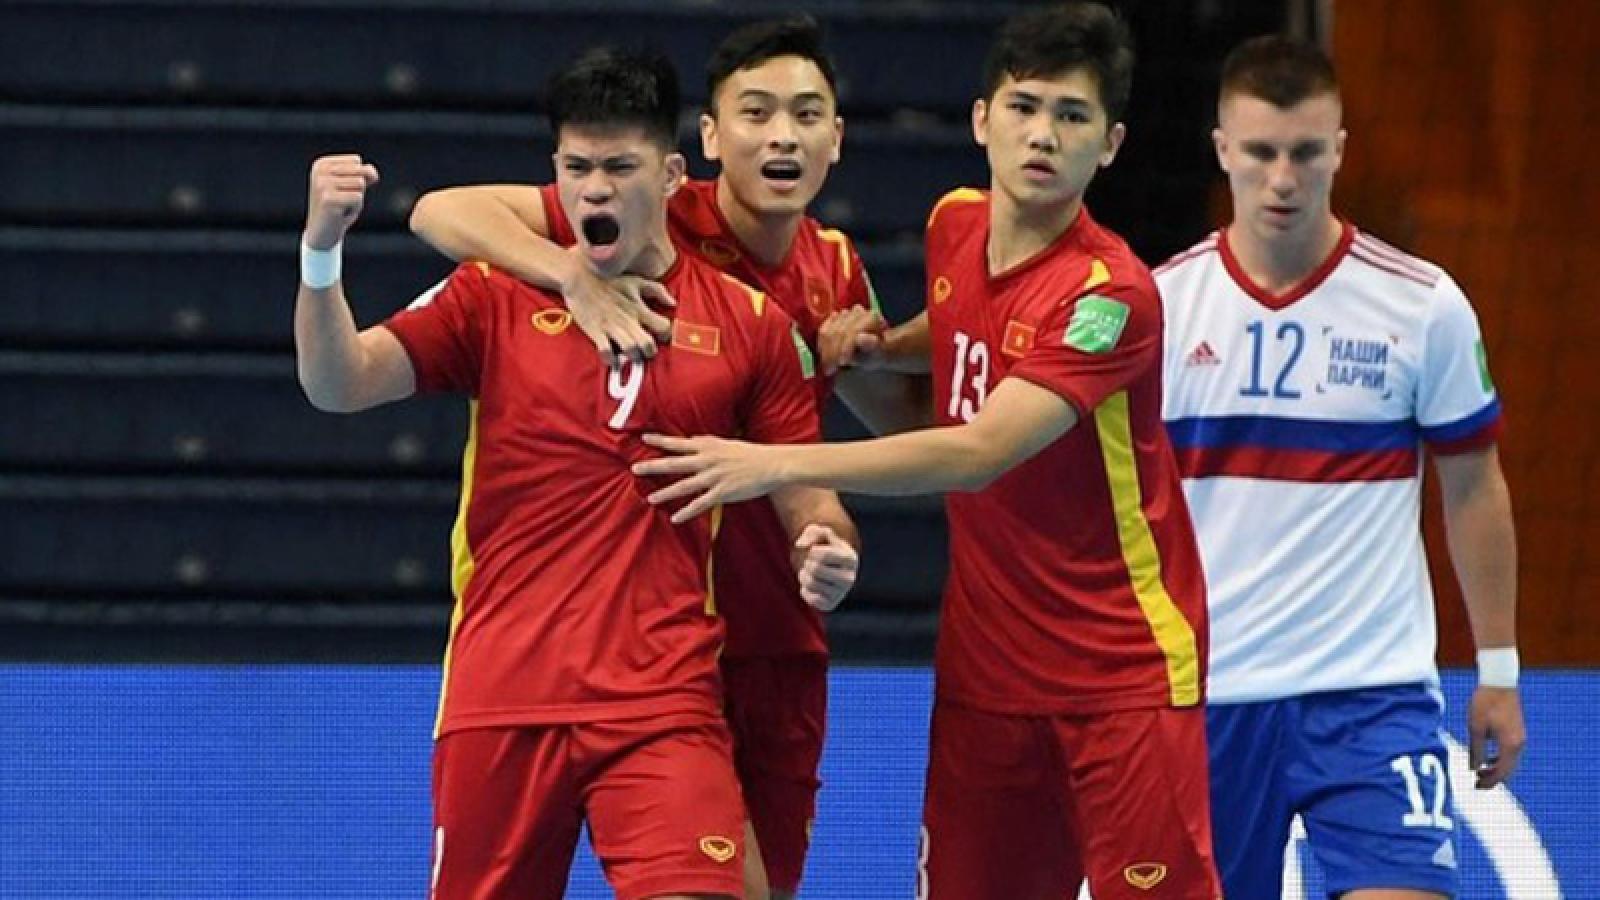 Vietnam futsal team ranked sixth in latest Asian rankings